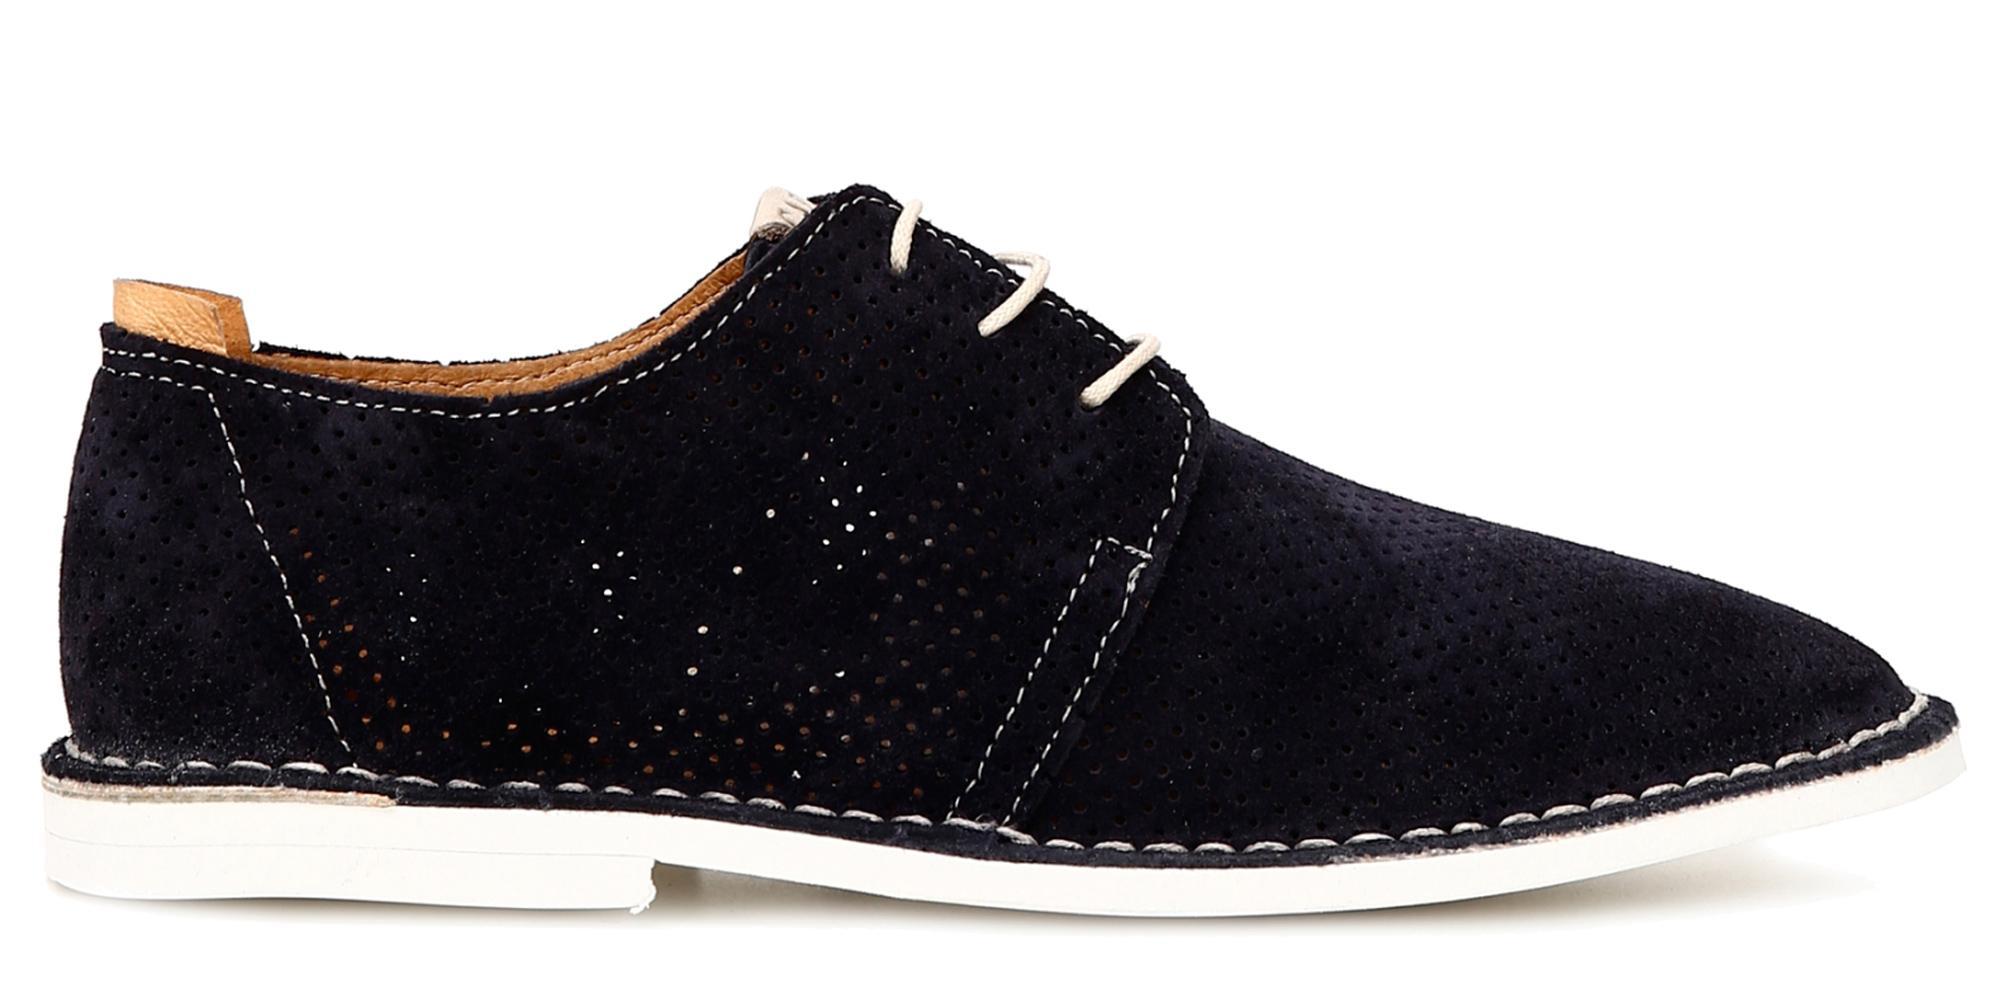 Noir blu in forata crosta eBay Cafè Derby uomo scarpe TD632 wBKCOq